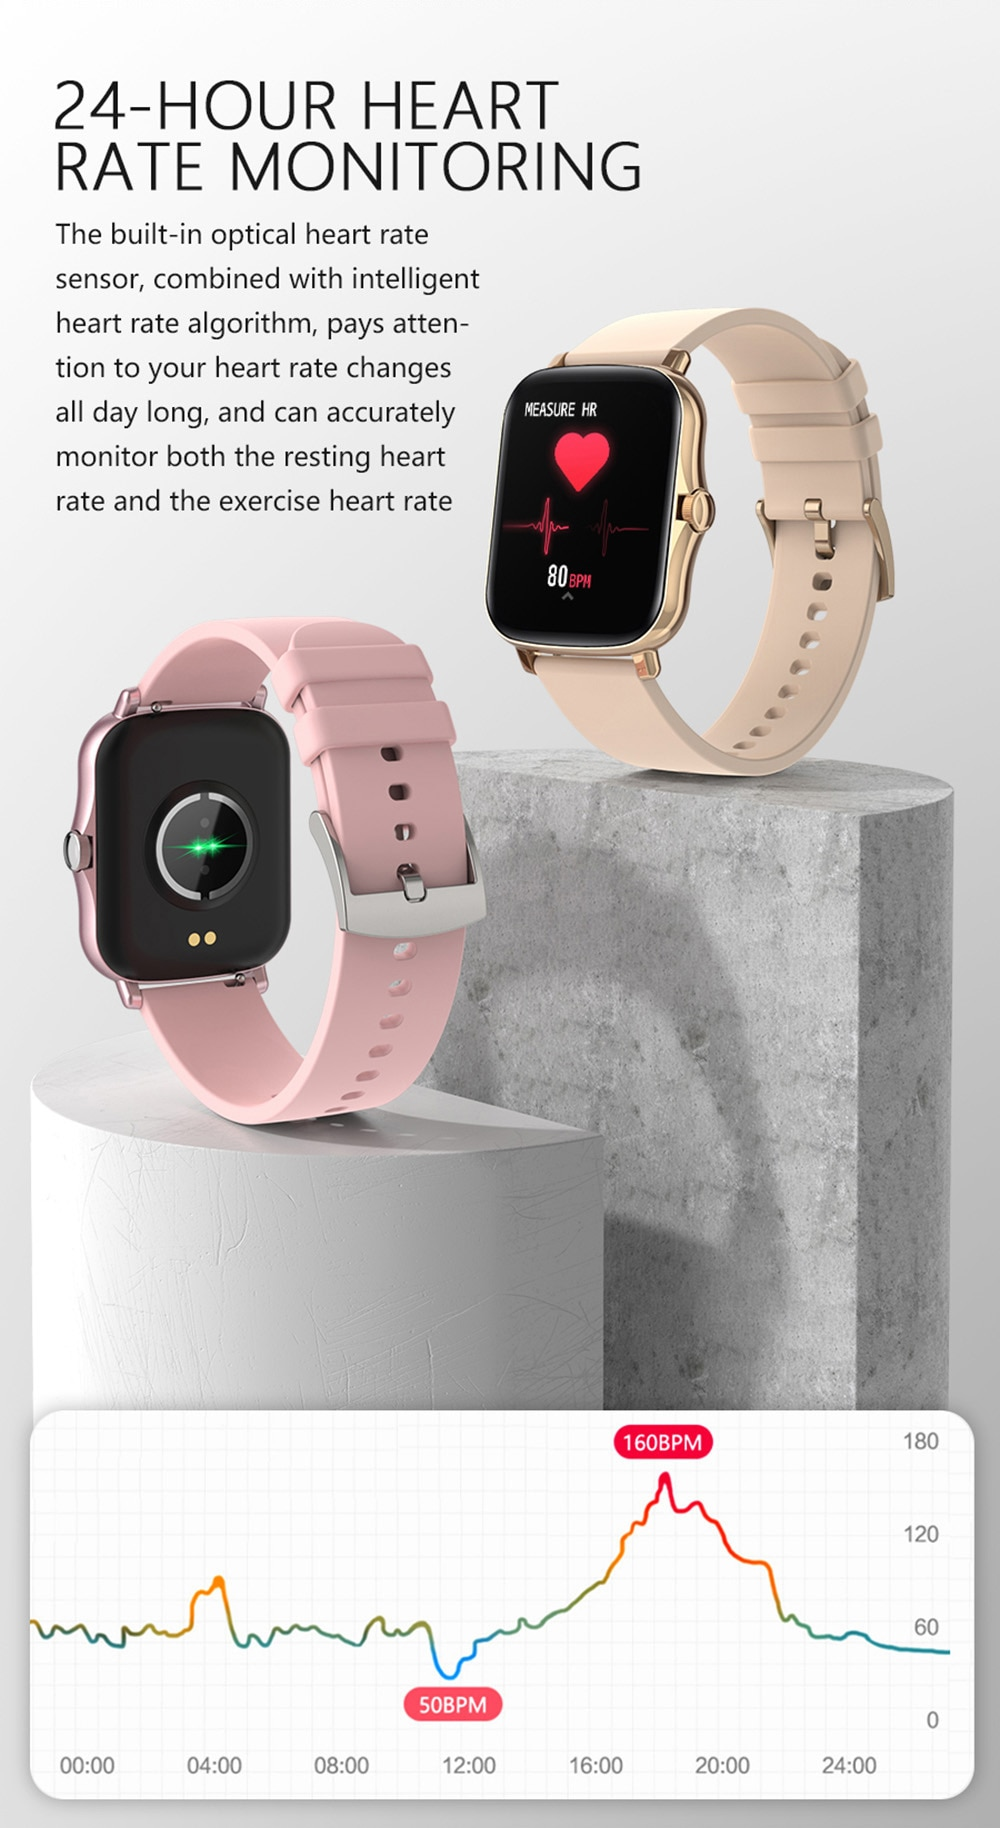 Hddcab267bf0b42cb817780f029515f87h COLMI P8 Plus 1.69 inch 2021 Smart Watch Men Full Touch Fitness Tracker IP67 waterproof Women GTS 2 Smartwatch for Xiaomi phone